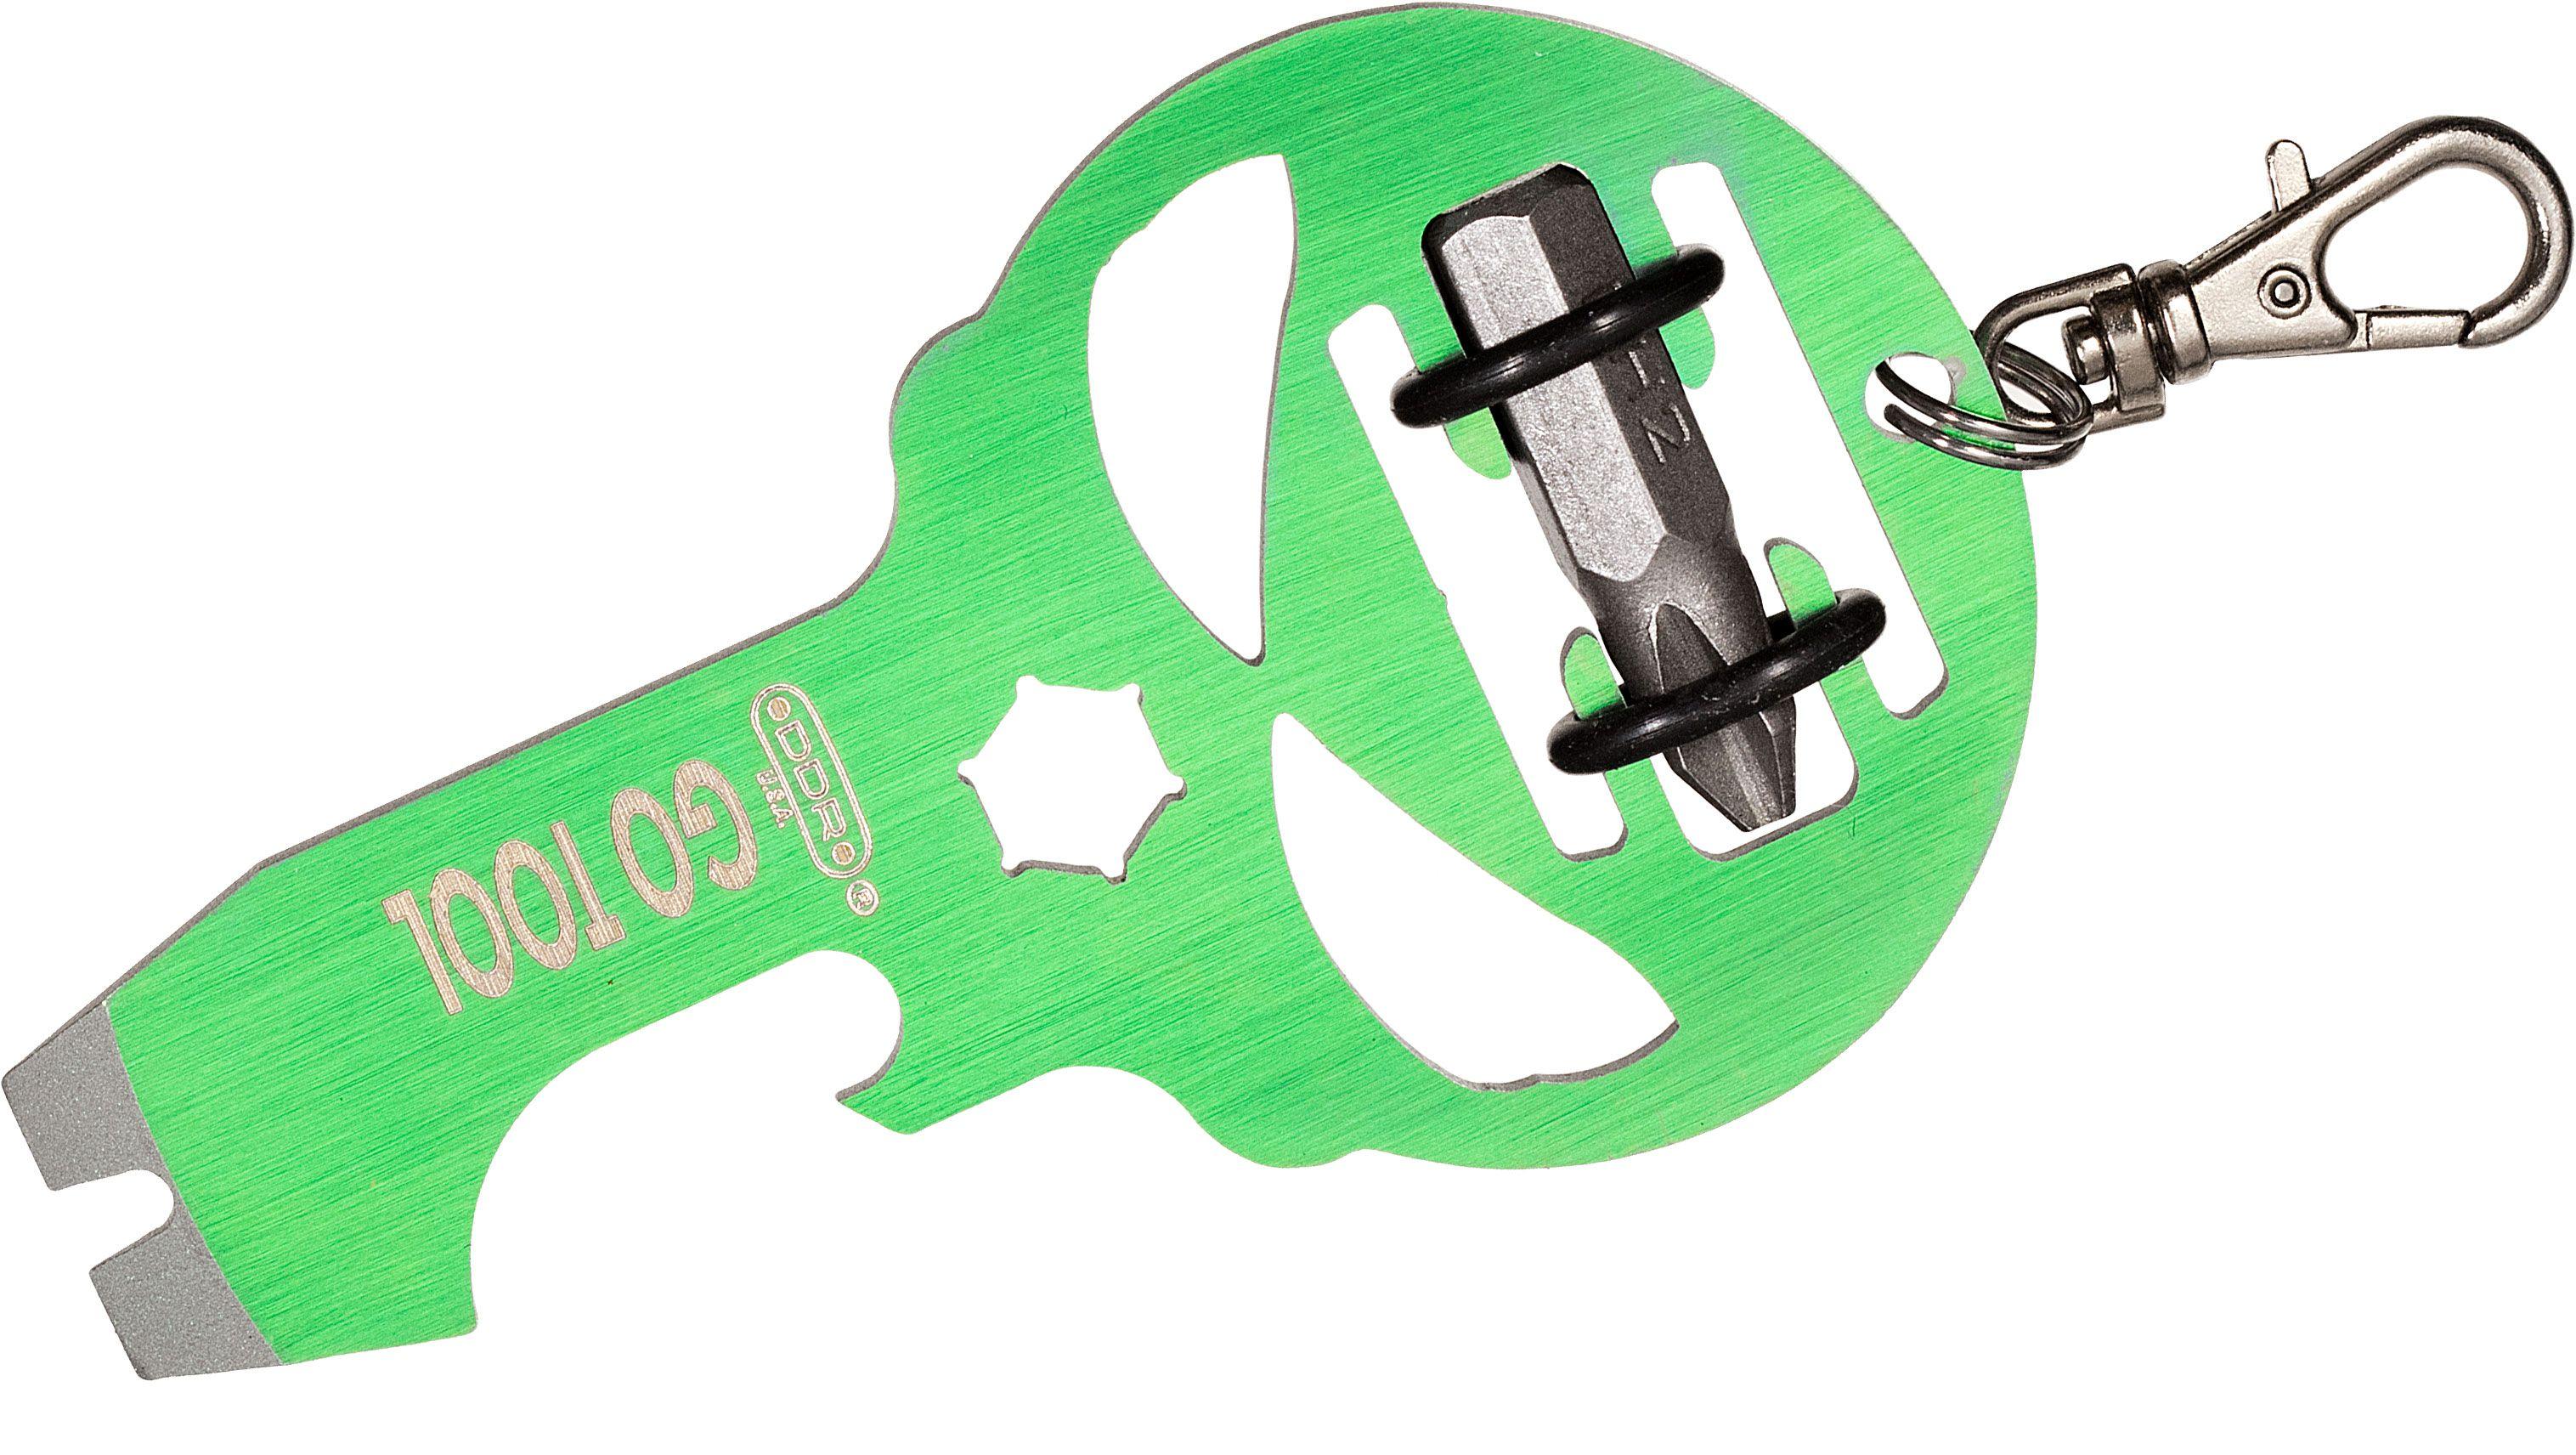 DGT Gear Titanium GO TOOL, Green Anodized